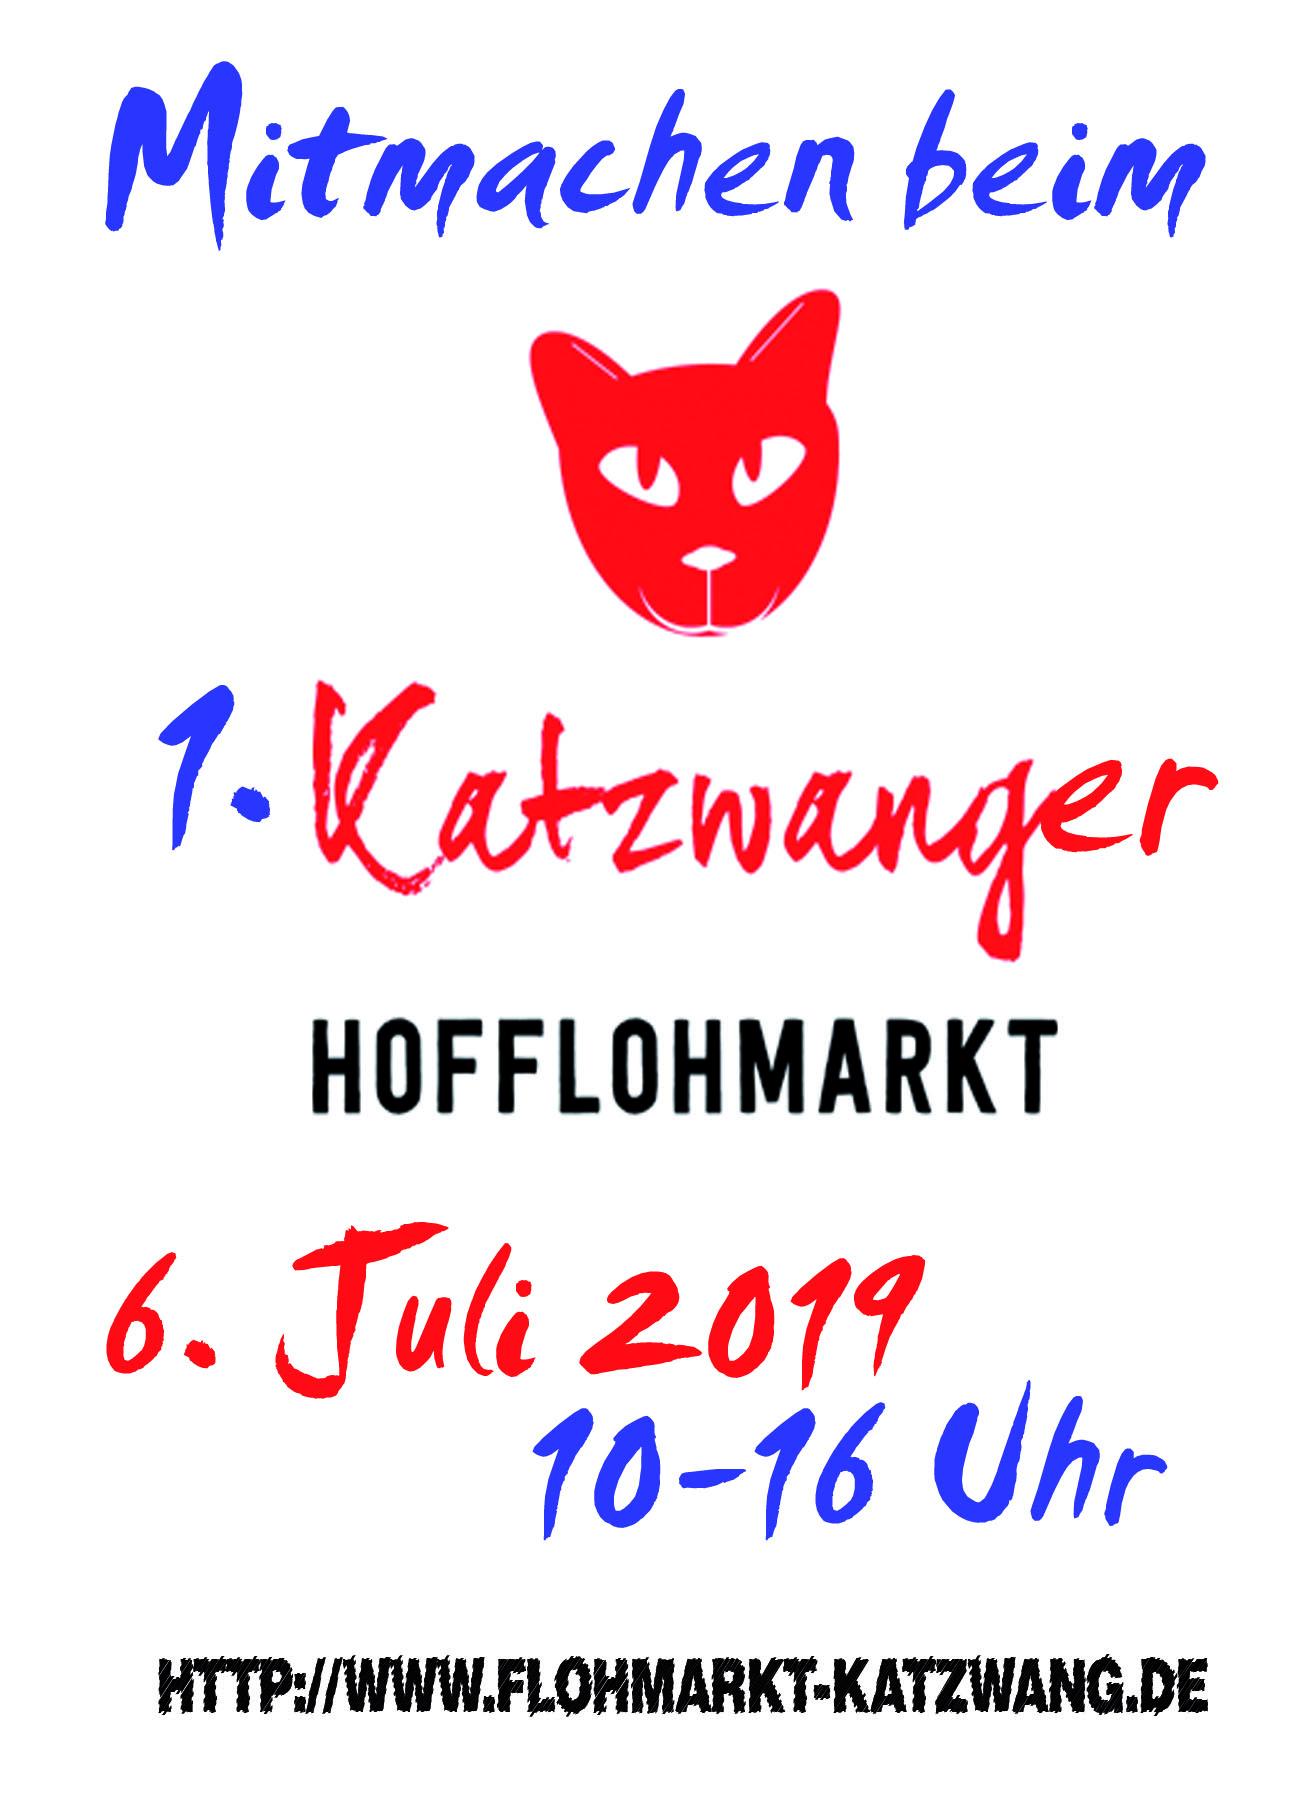 Hofflohmarkt Katzwang Meier Magazin De